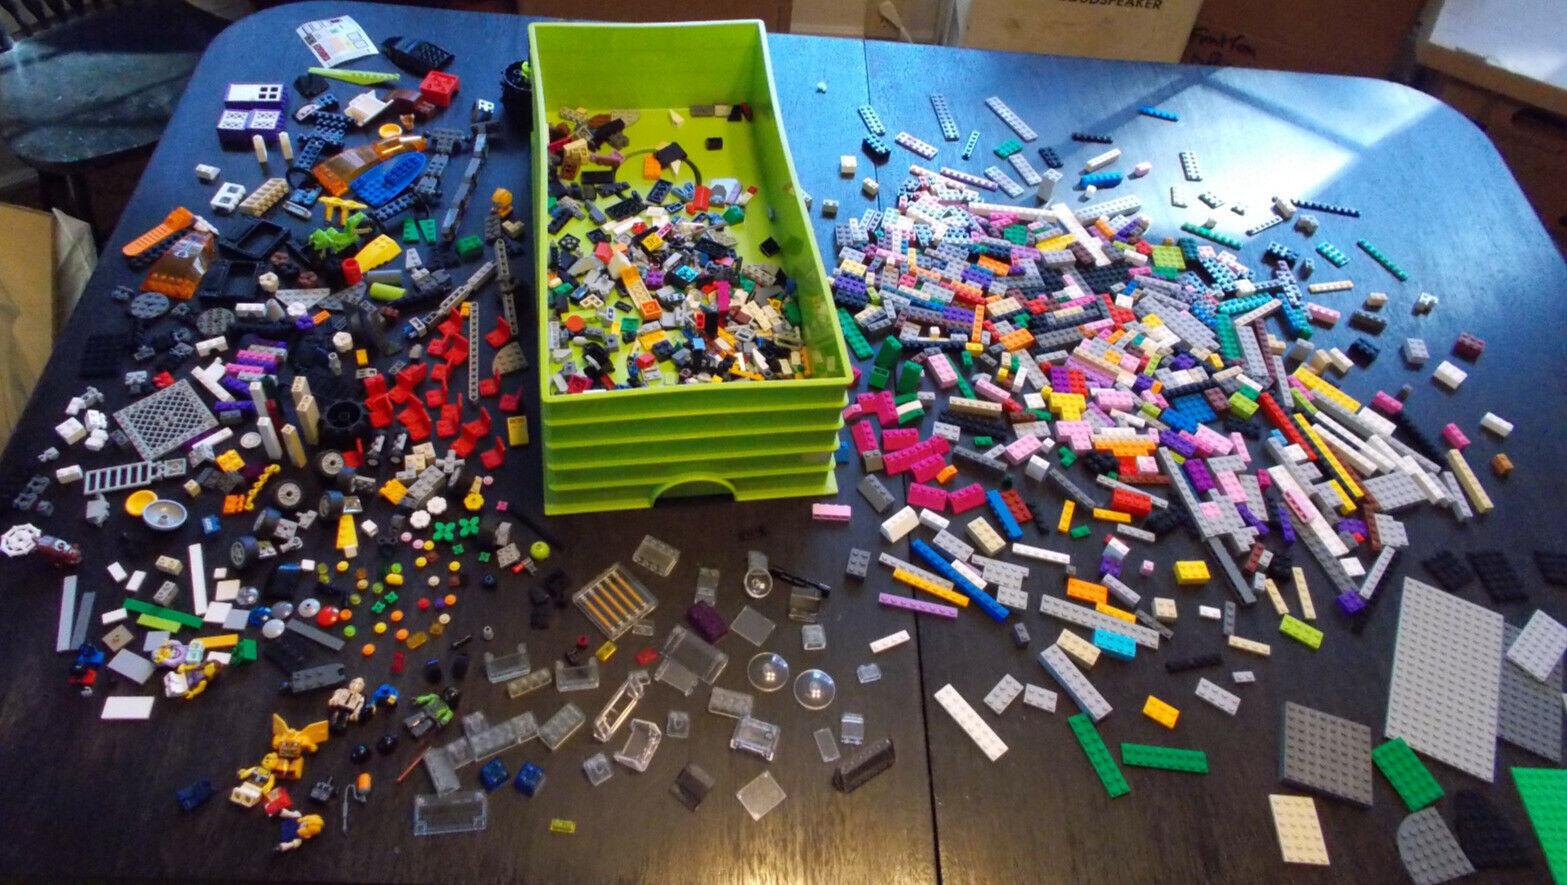 Lot Of 4 Lbs+ Lbs+ Lbs+ Bag Of Lego Friends Bulk Lego Parts W Lego Bin Storage Container a4edfb